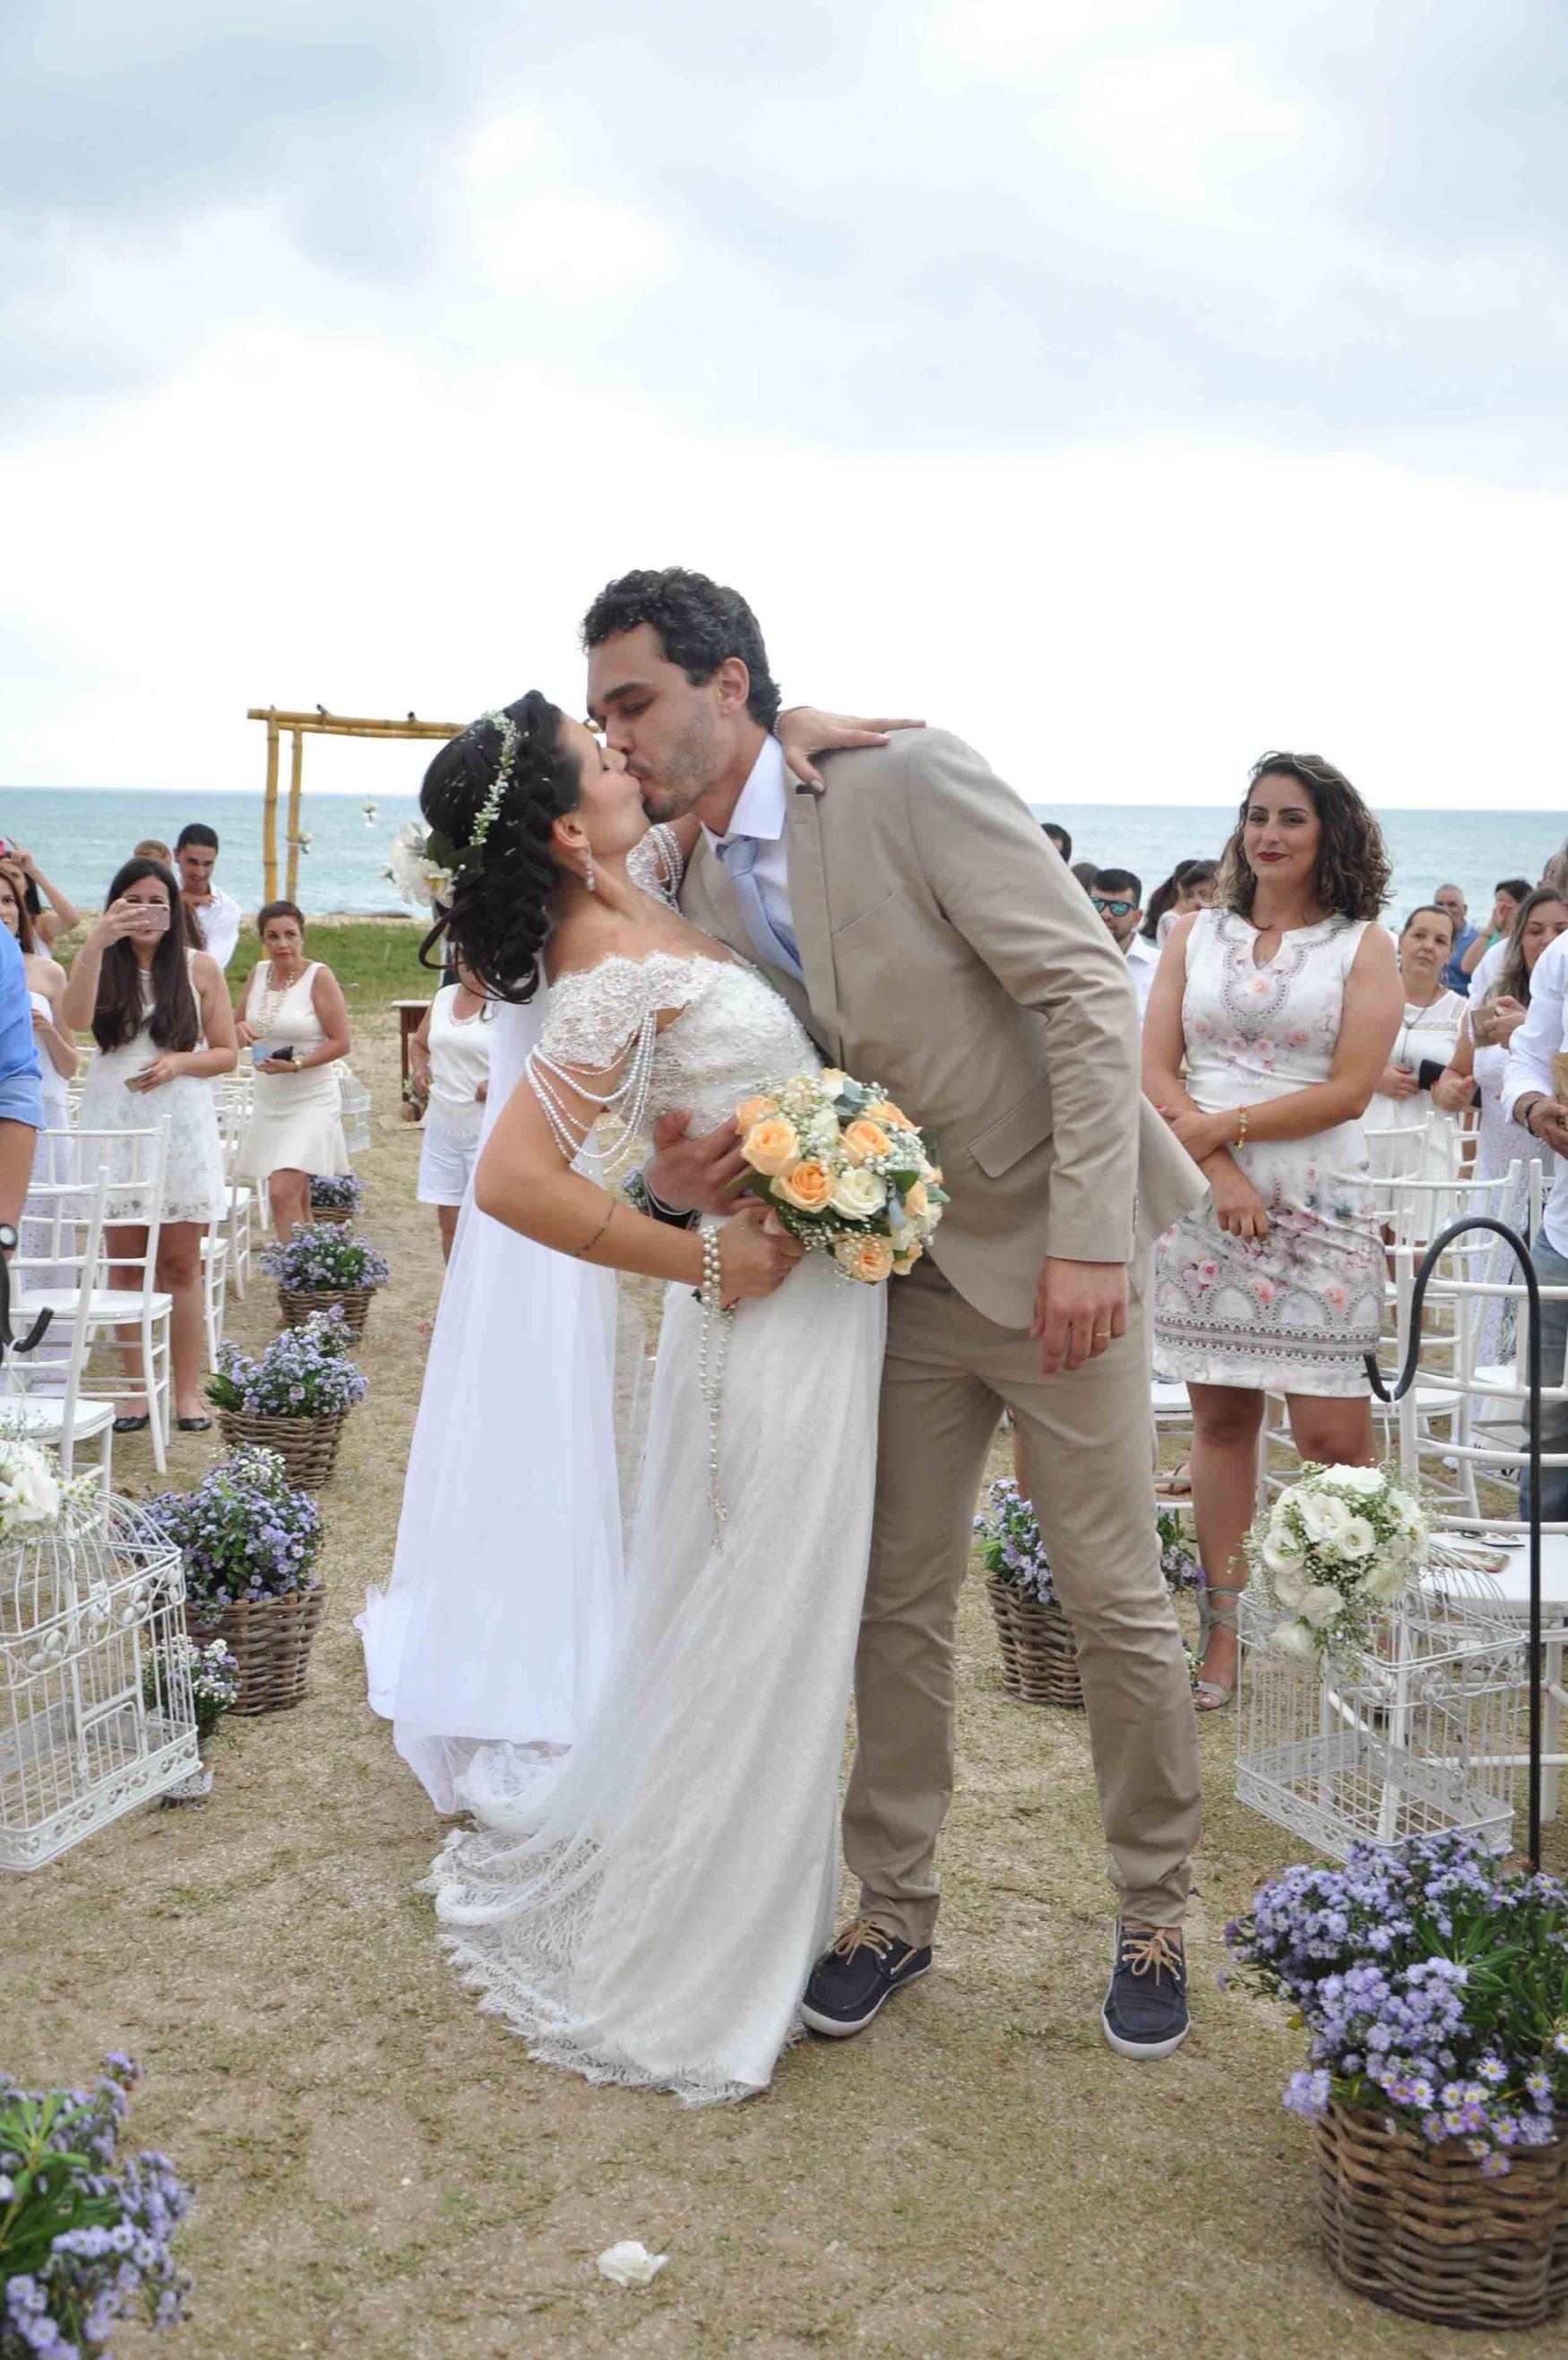 casamento simples na praia